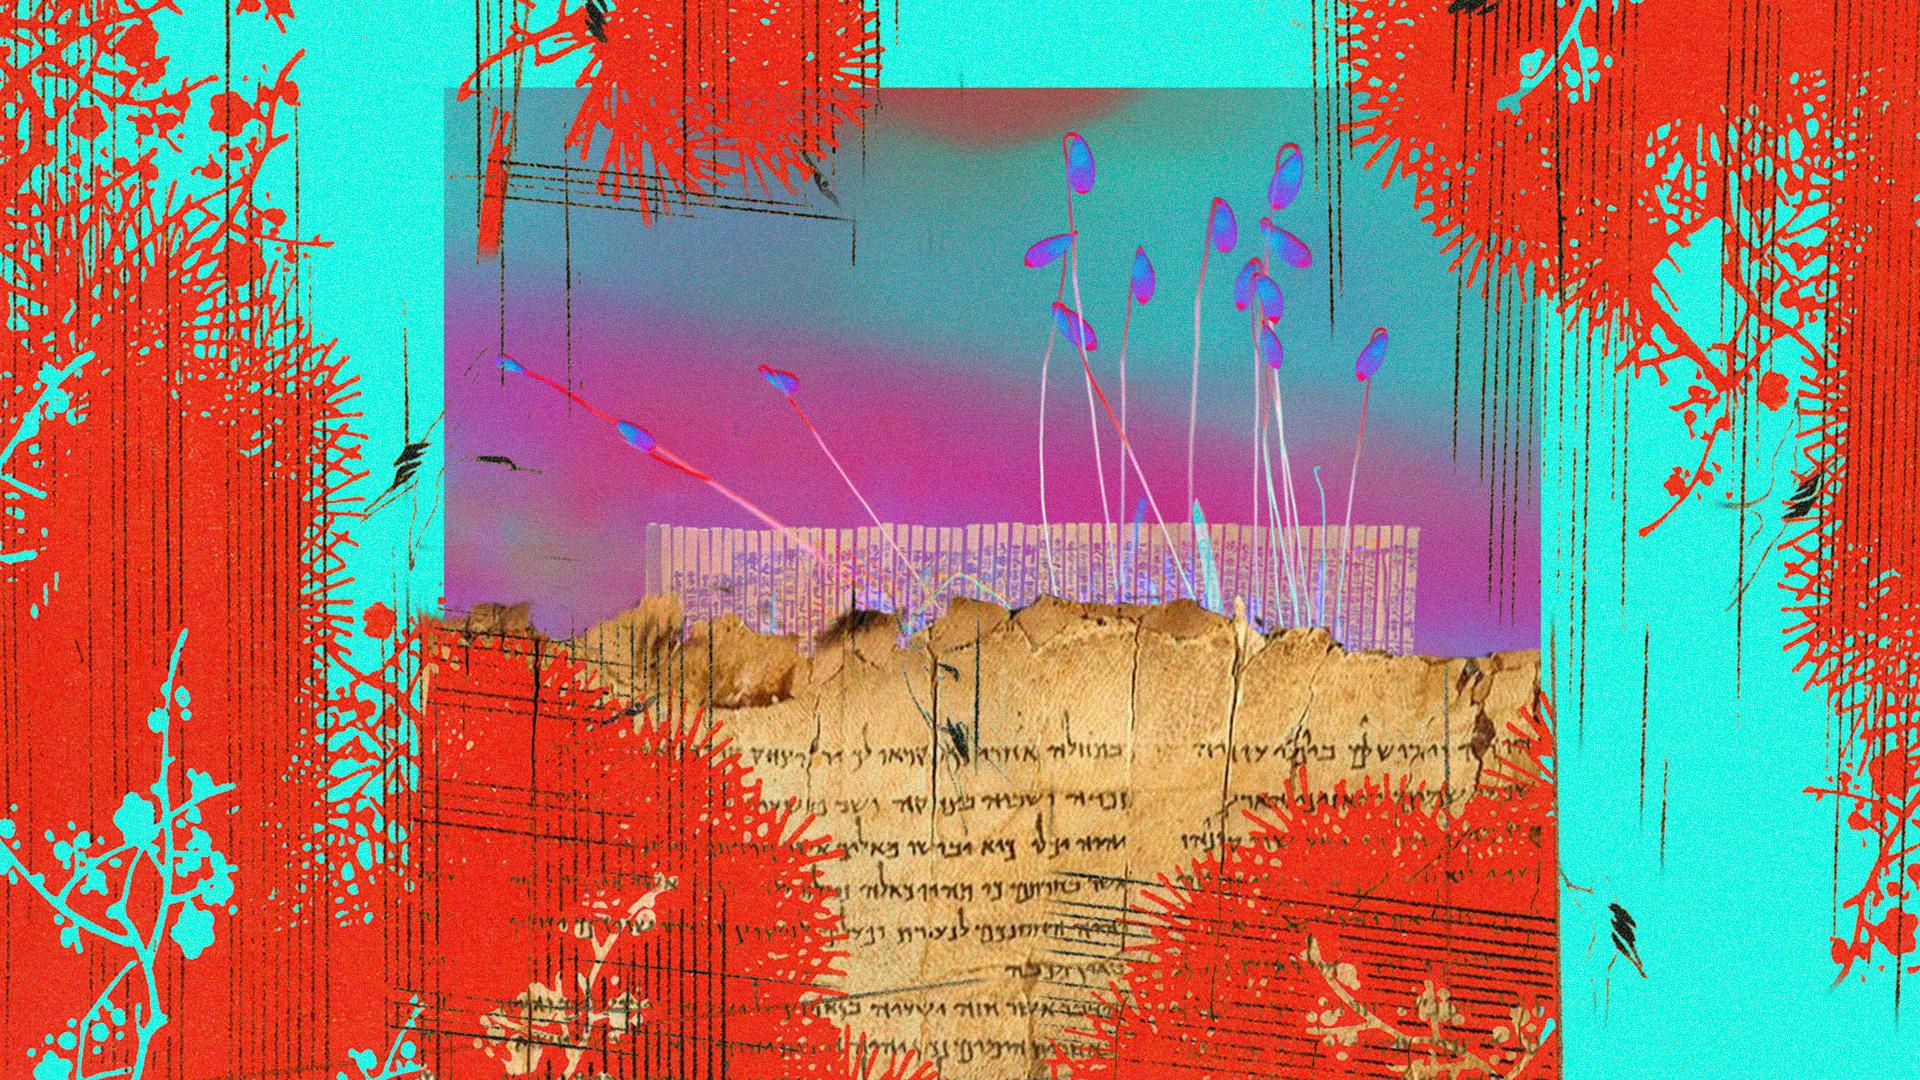 Postpandemia_01